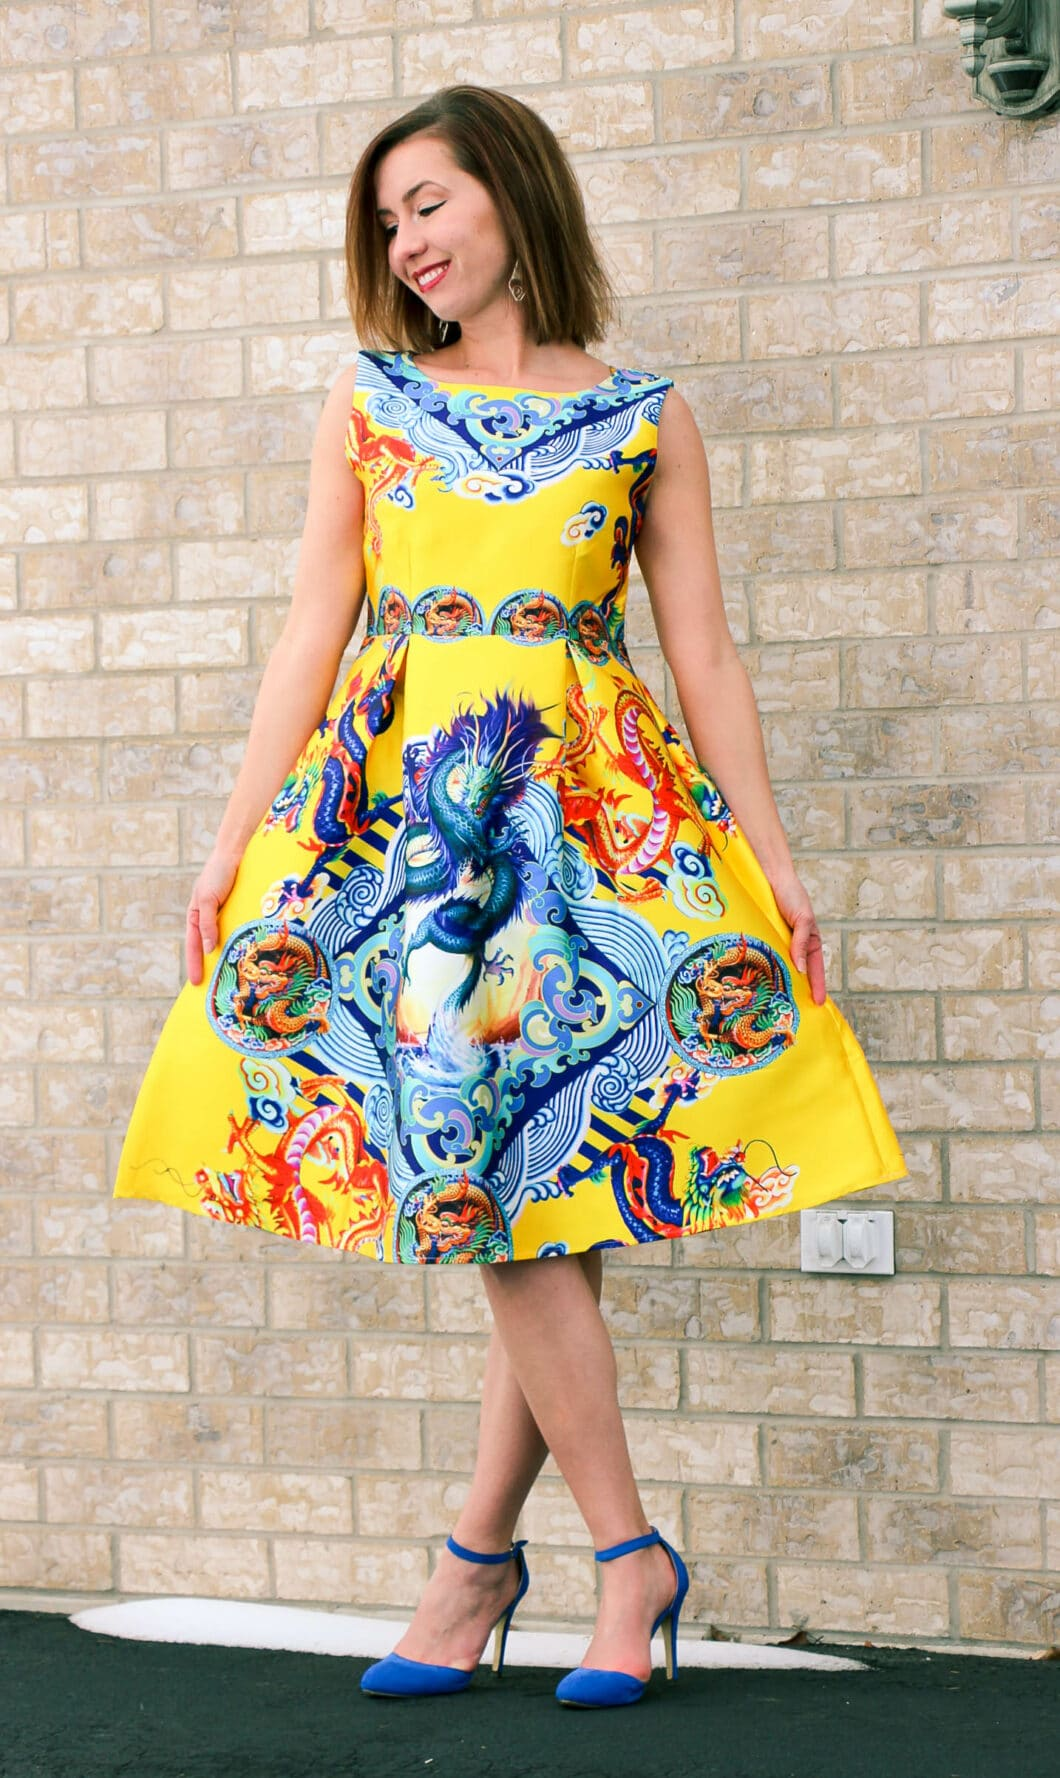 Dresses & Dragons